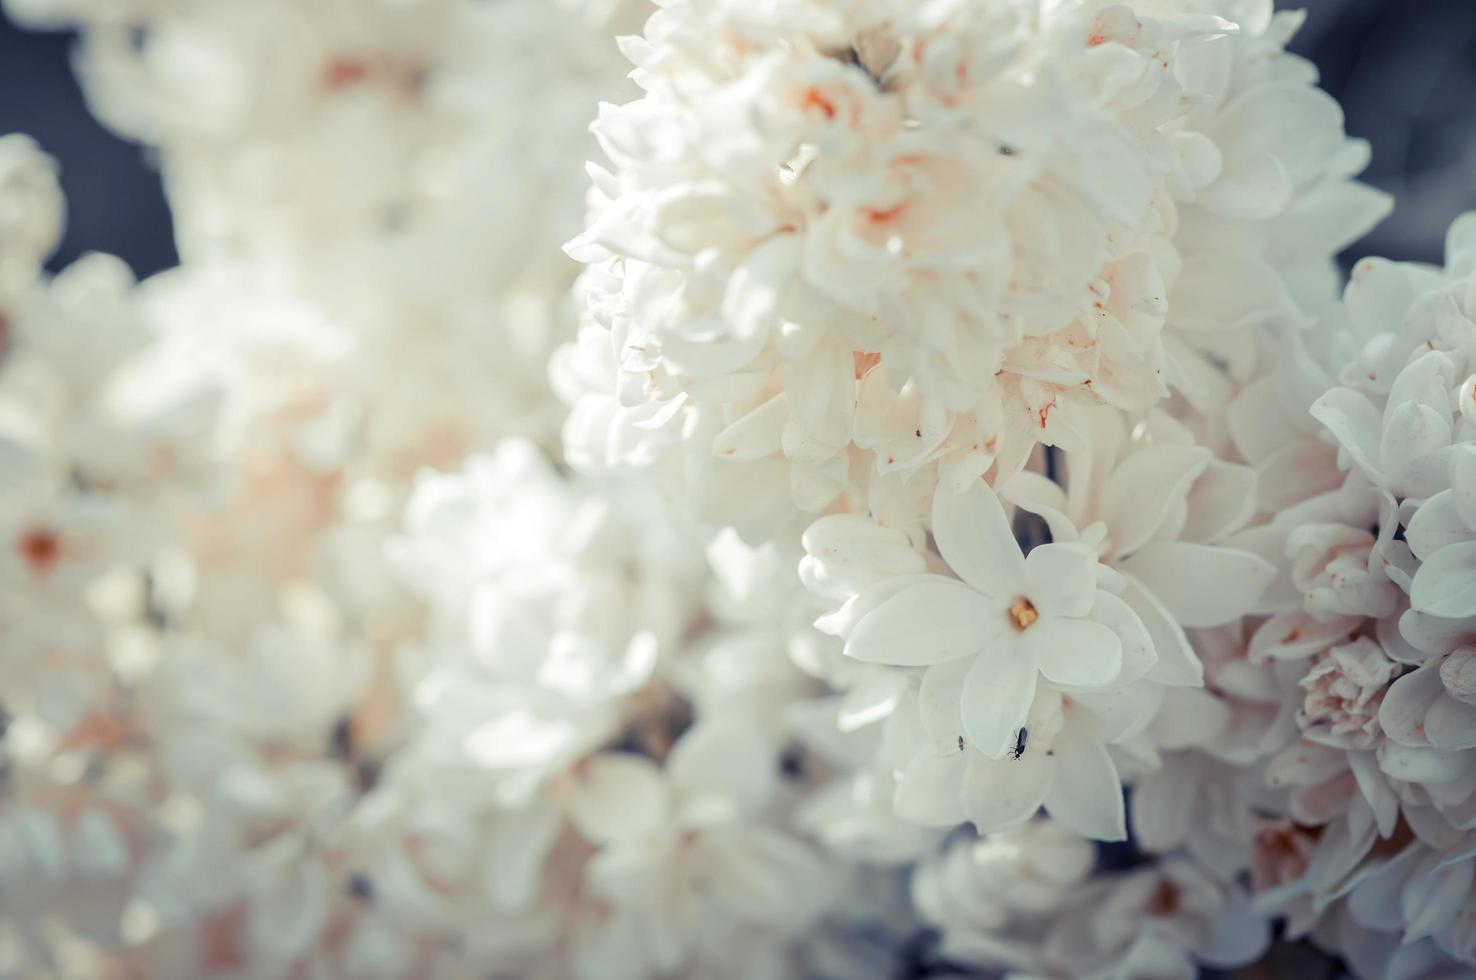 vit lila blomning, selektiv fokus foto